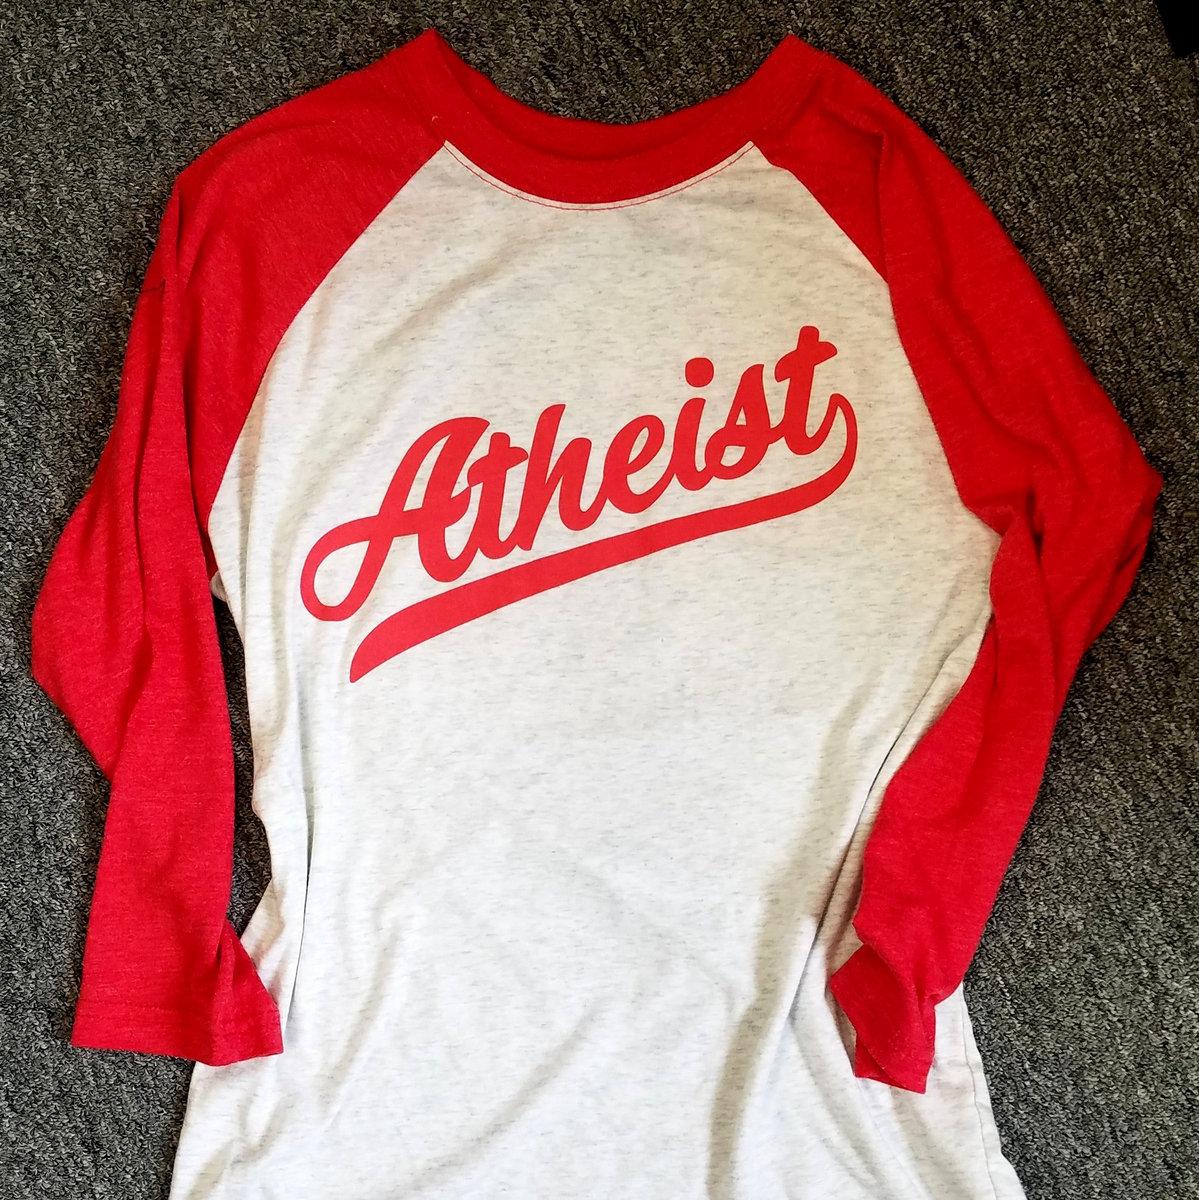 98cd541f Offensive Atheist T Shirts - DREAMWORKS